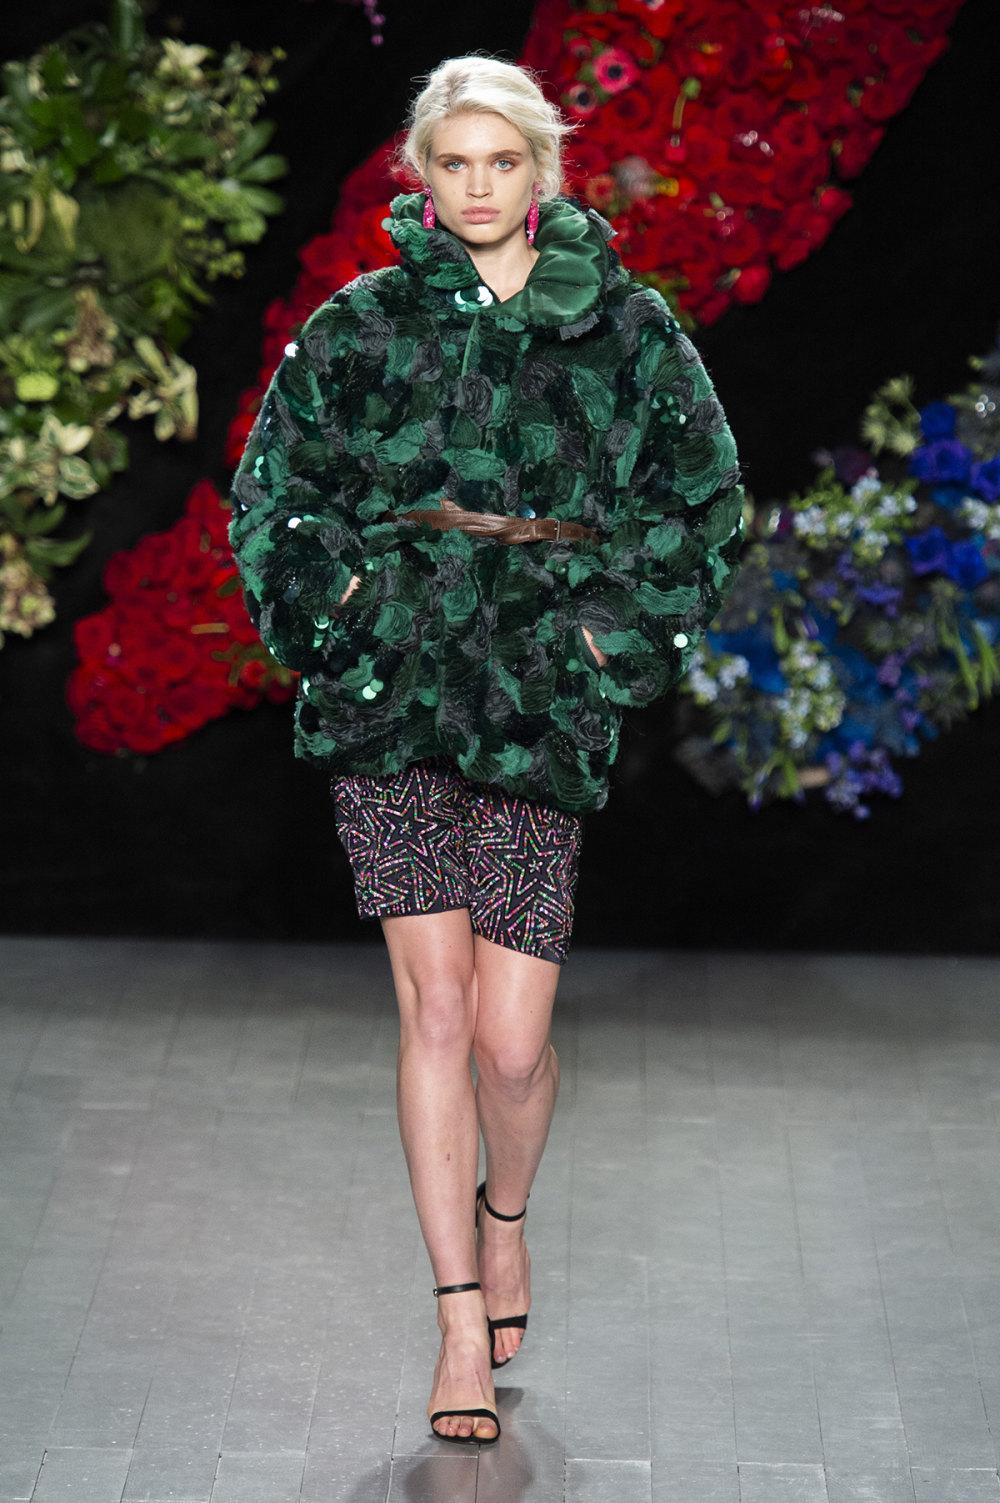 Roberta Einer时装系列格子呢西装外套收紧腰部霓虹色腰带连帽衫-22.jpg